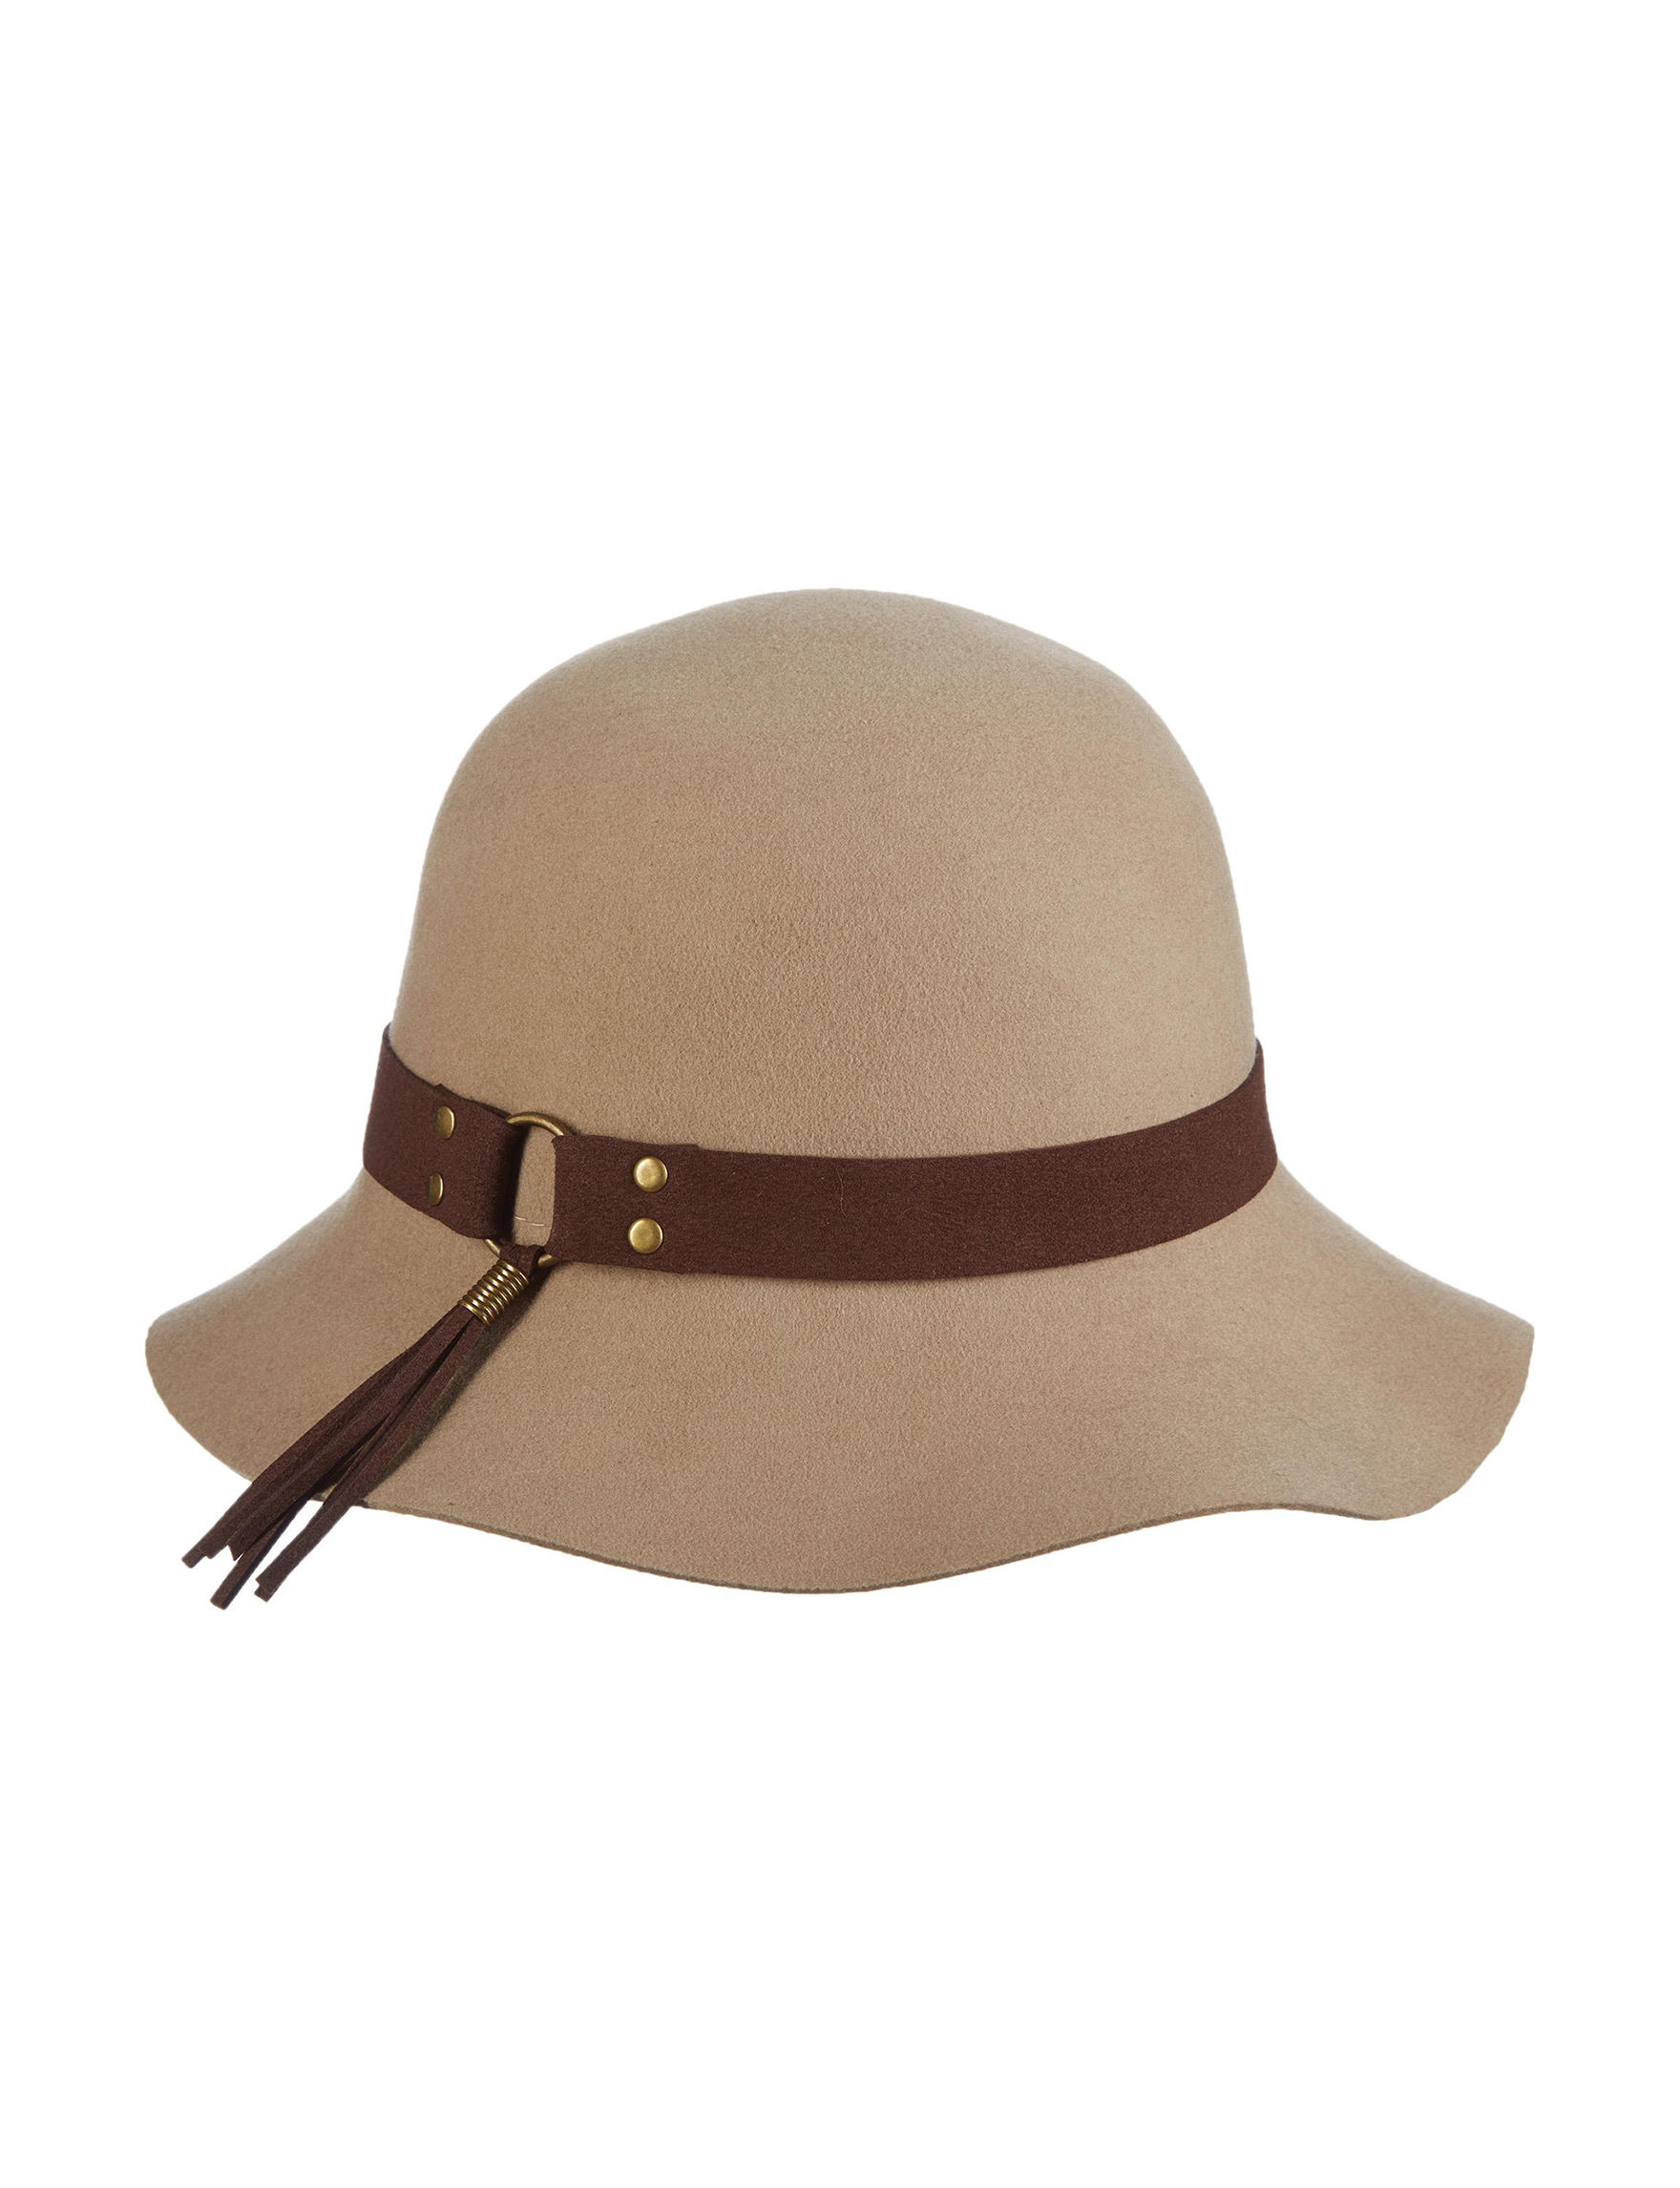 Callanan Camel Hats & Headwear